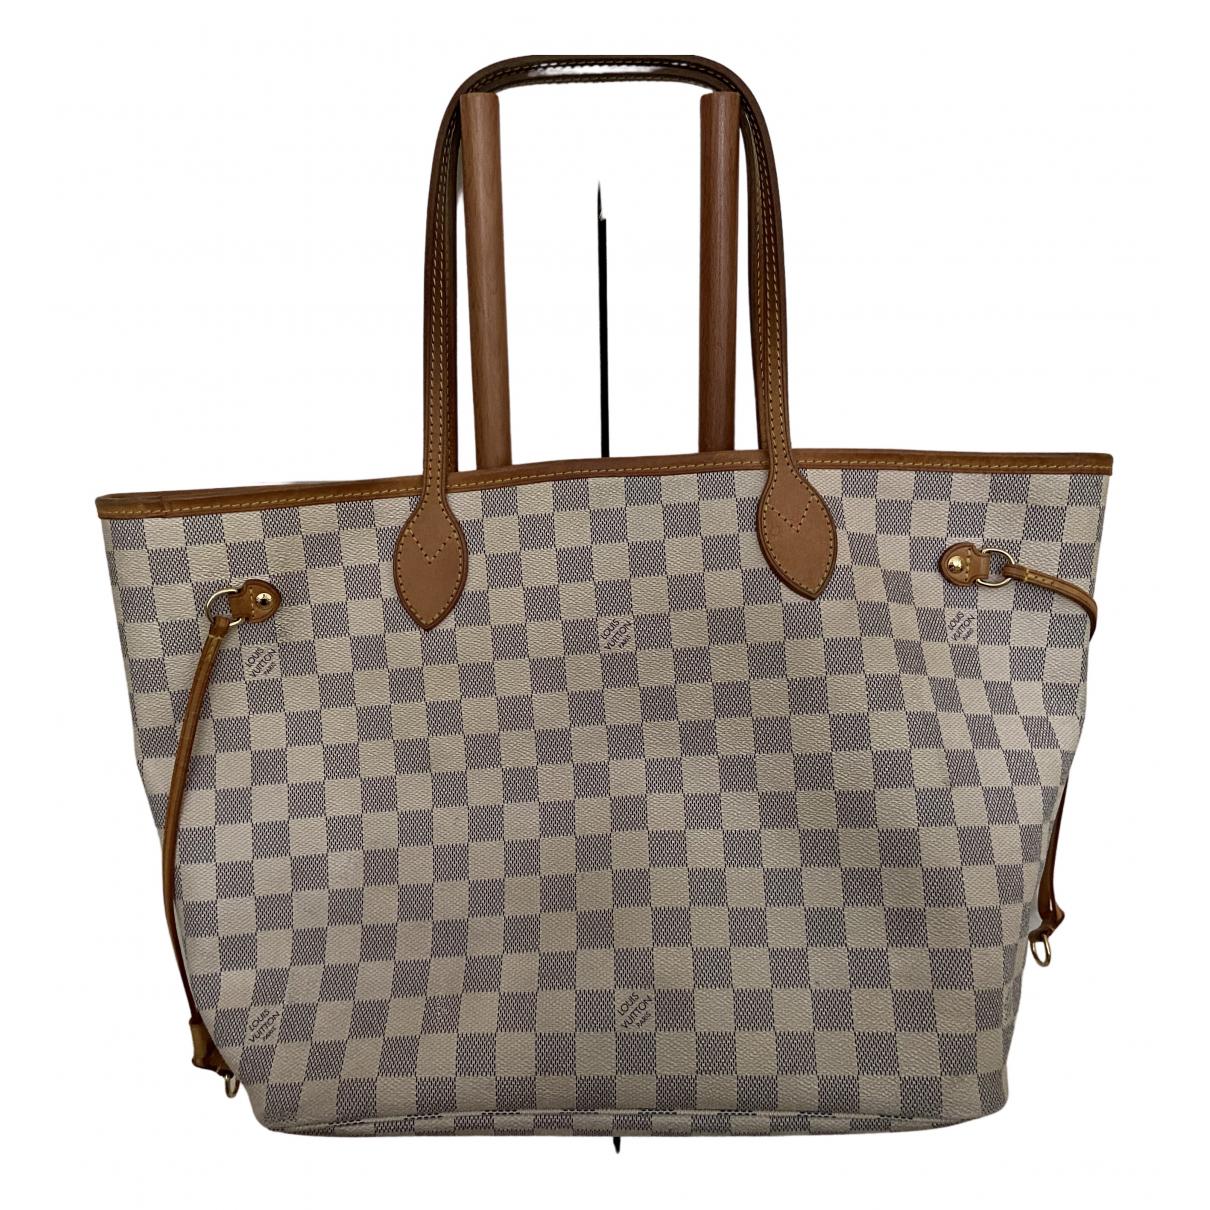 Louis Vuitton Neverfull Handtasche in  Beige Leinen